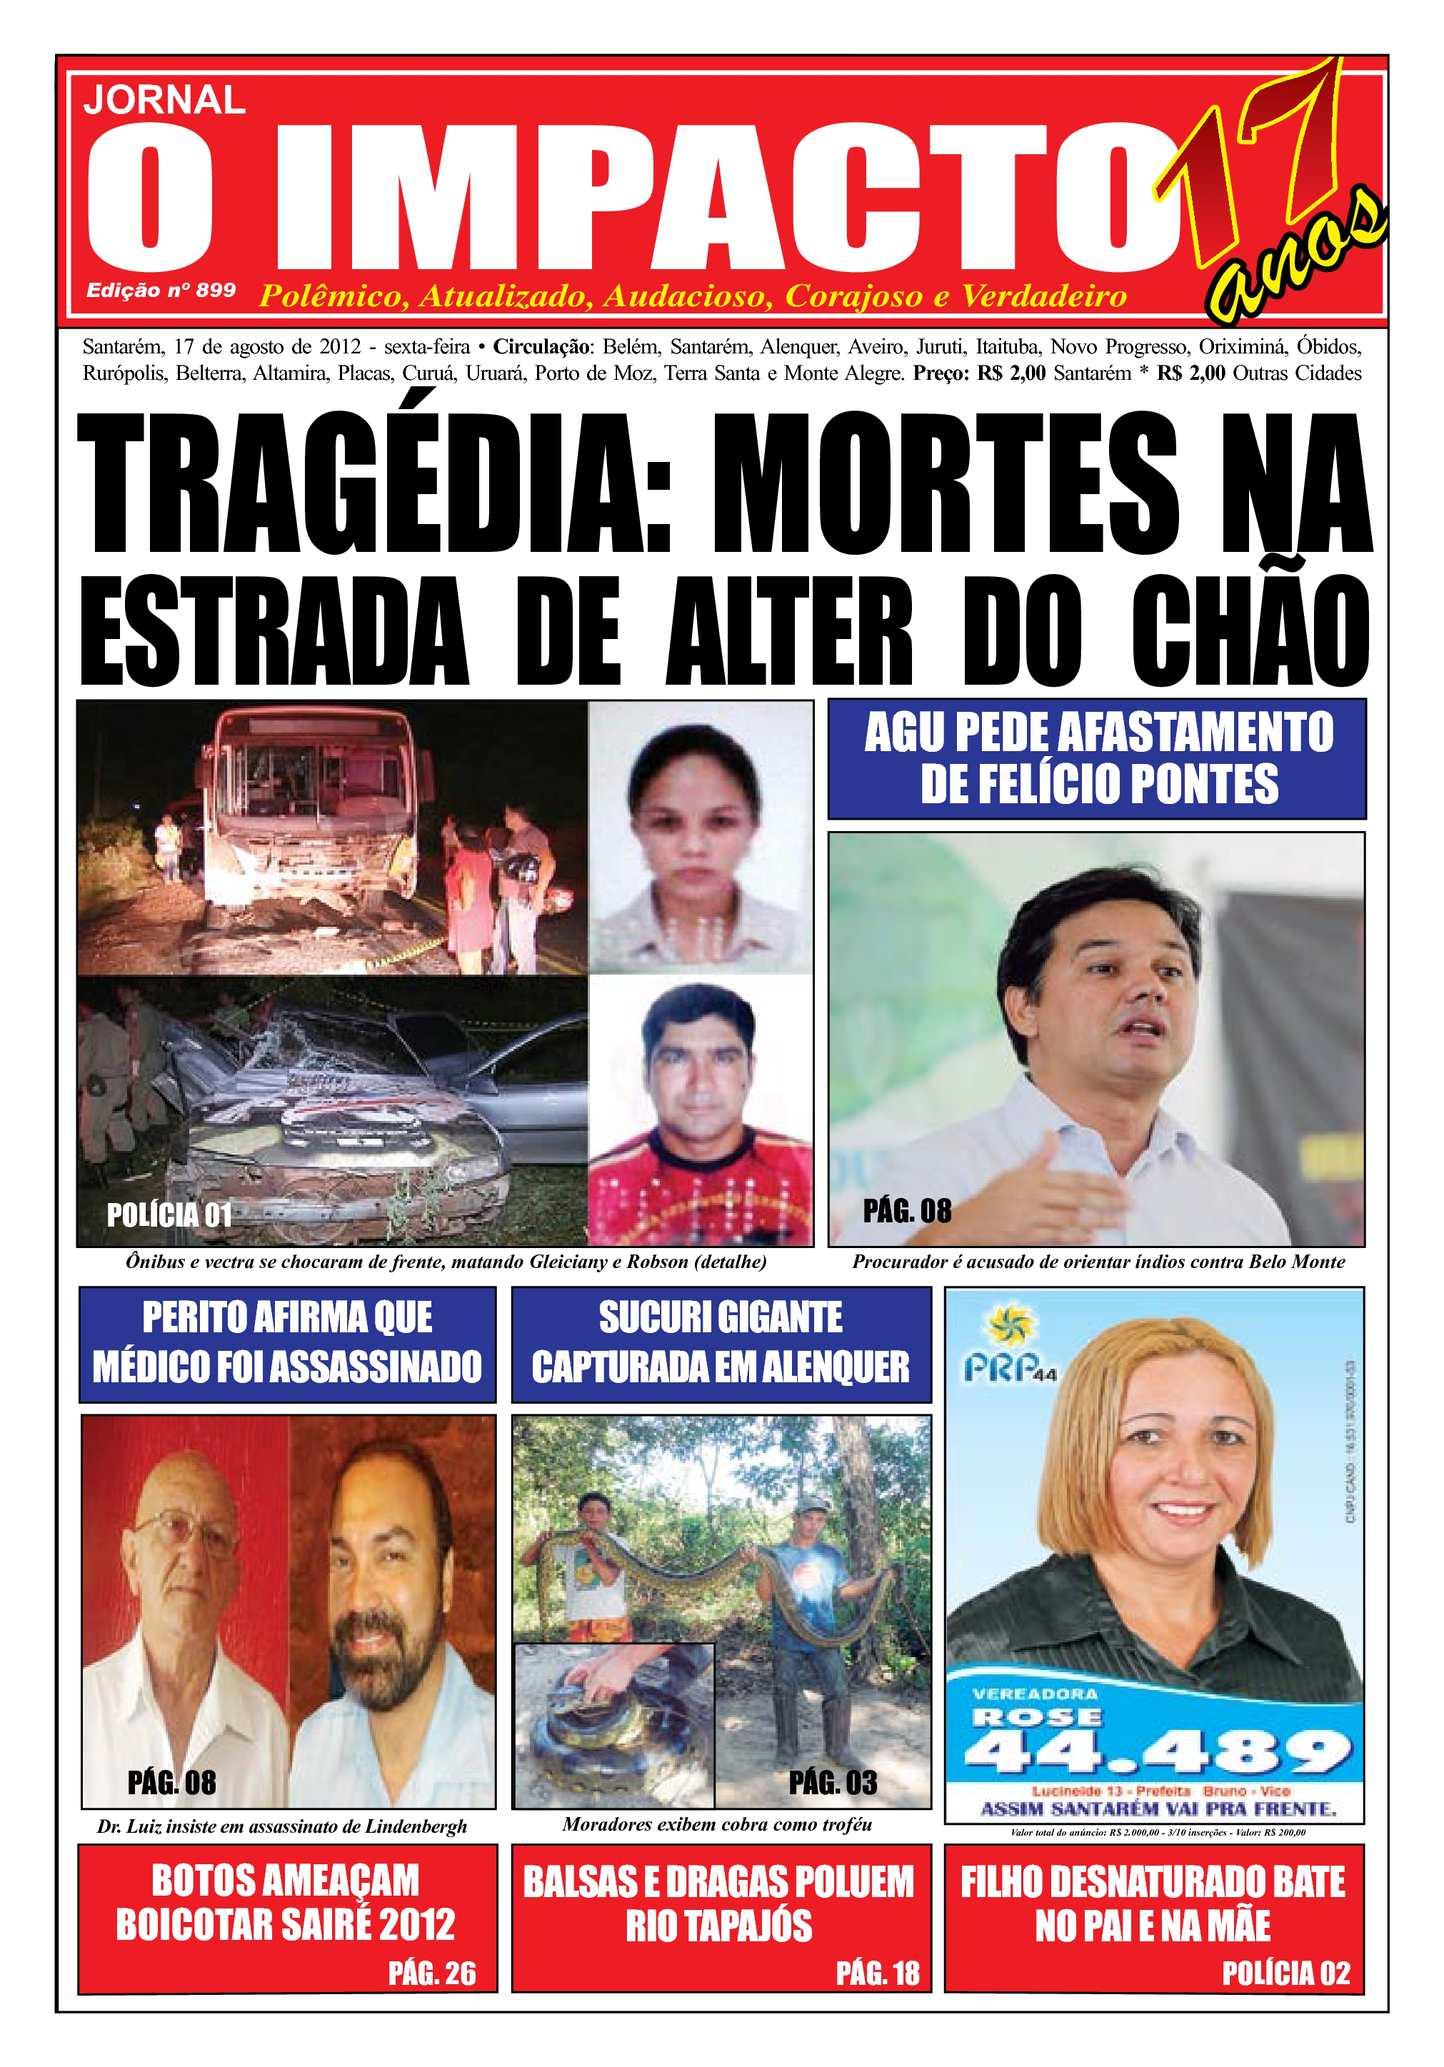 ca6b65cd5 Calaméo - Jornal O Impacto Ed. 899